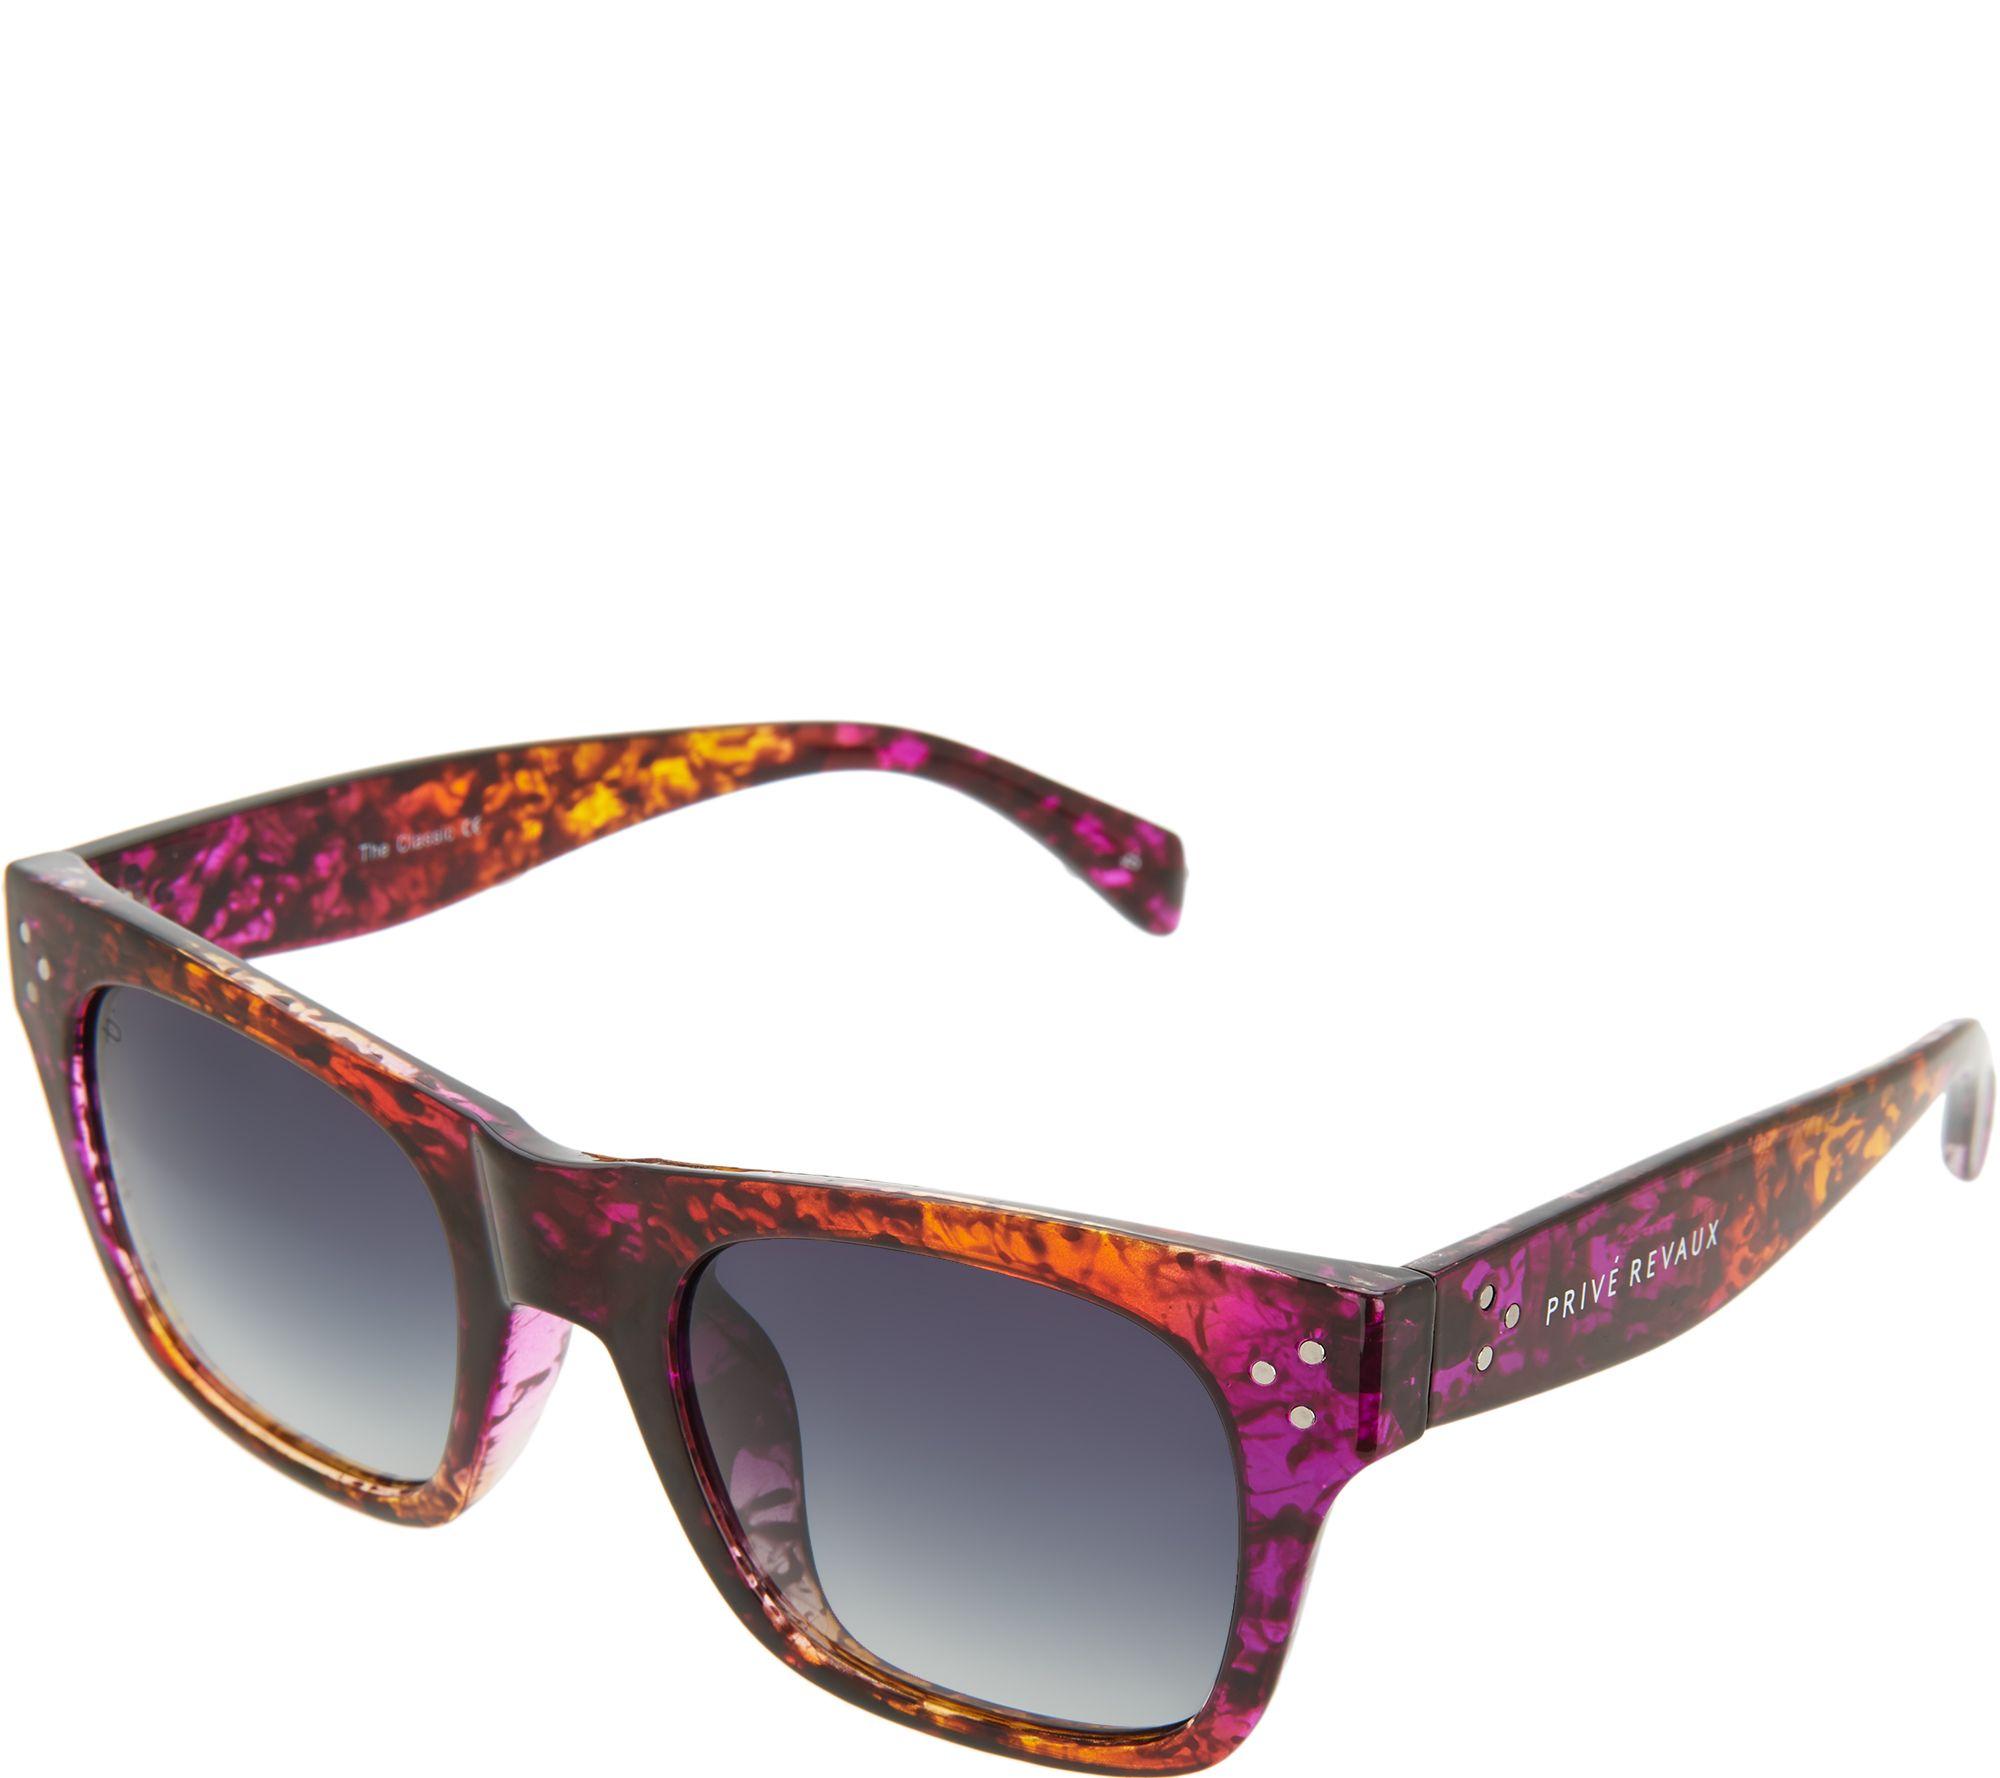 b0e8c4dd65 Prive Revaux The Classic Polarized Sunglasses - Page 1 — QVC.com